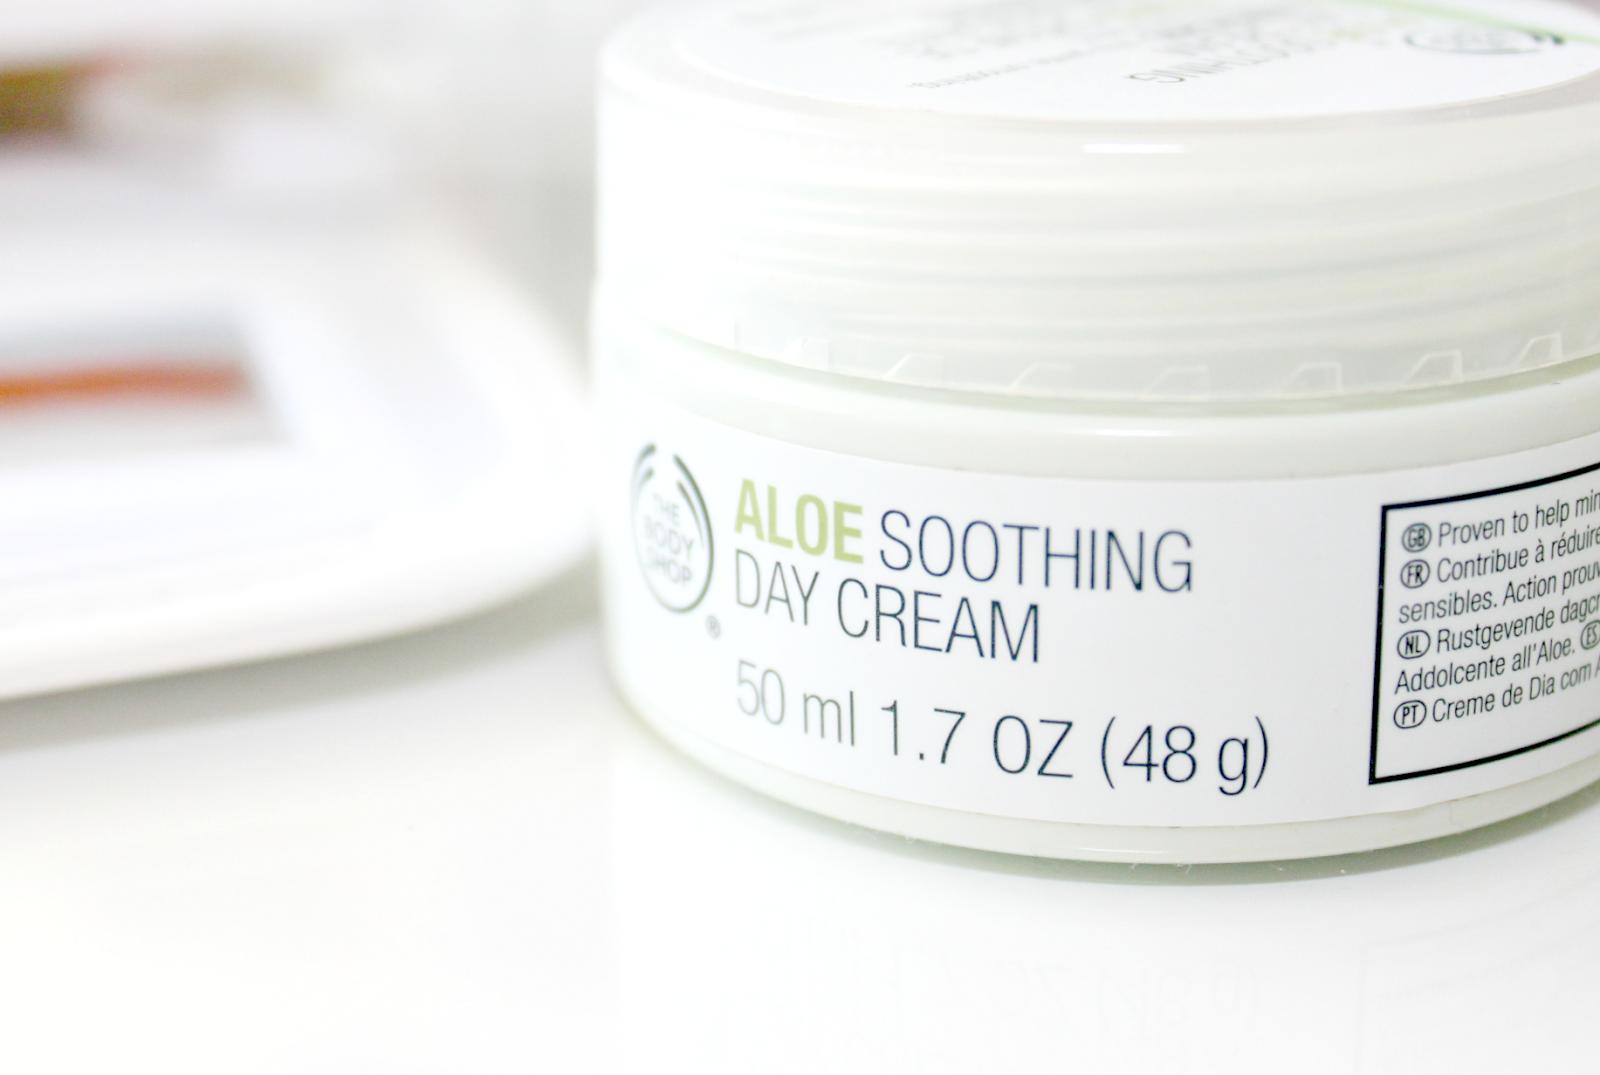 aloe soothing cream